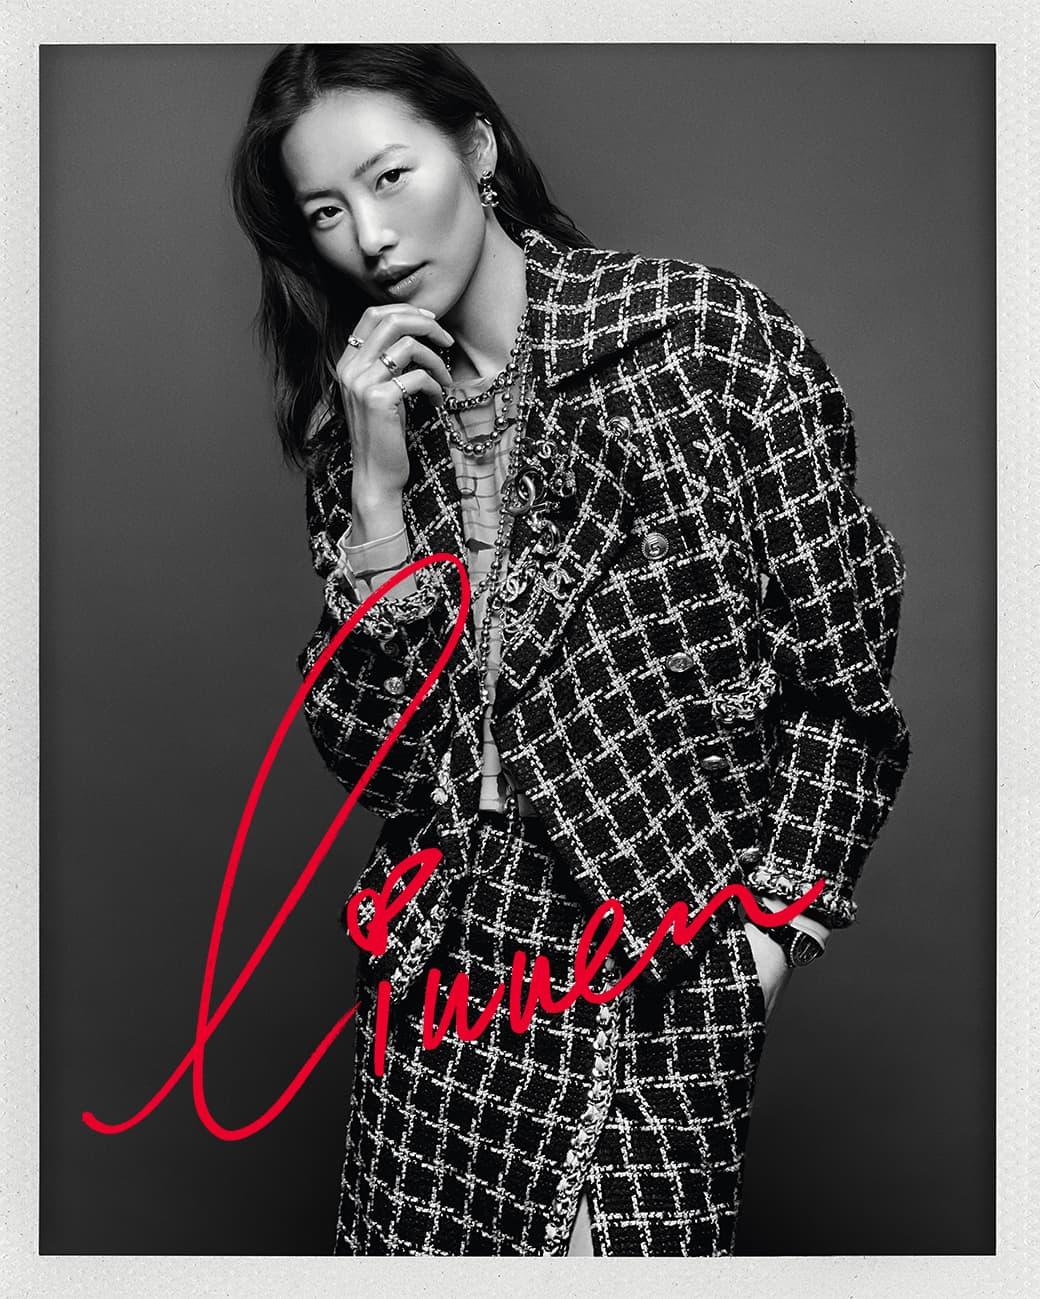 Chanel Fall 2021 Ambassadors Program Ad Campaign Photos